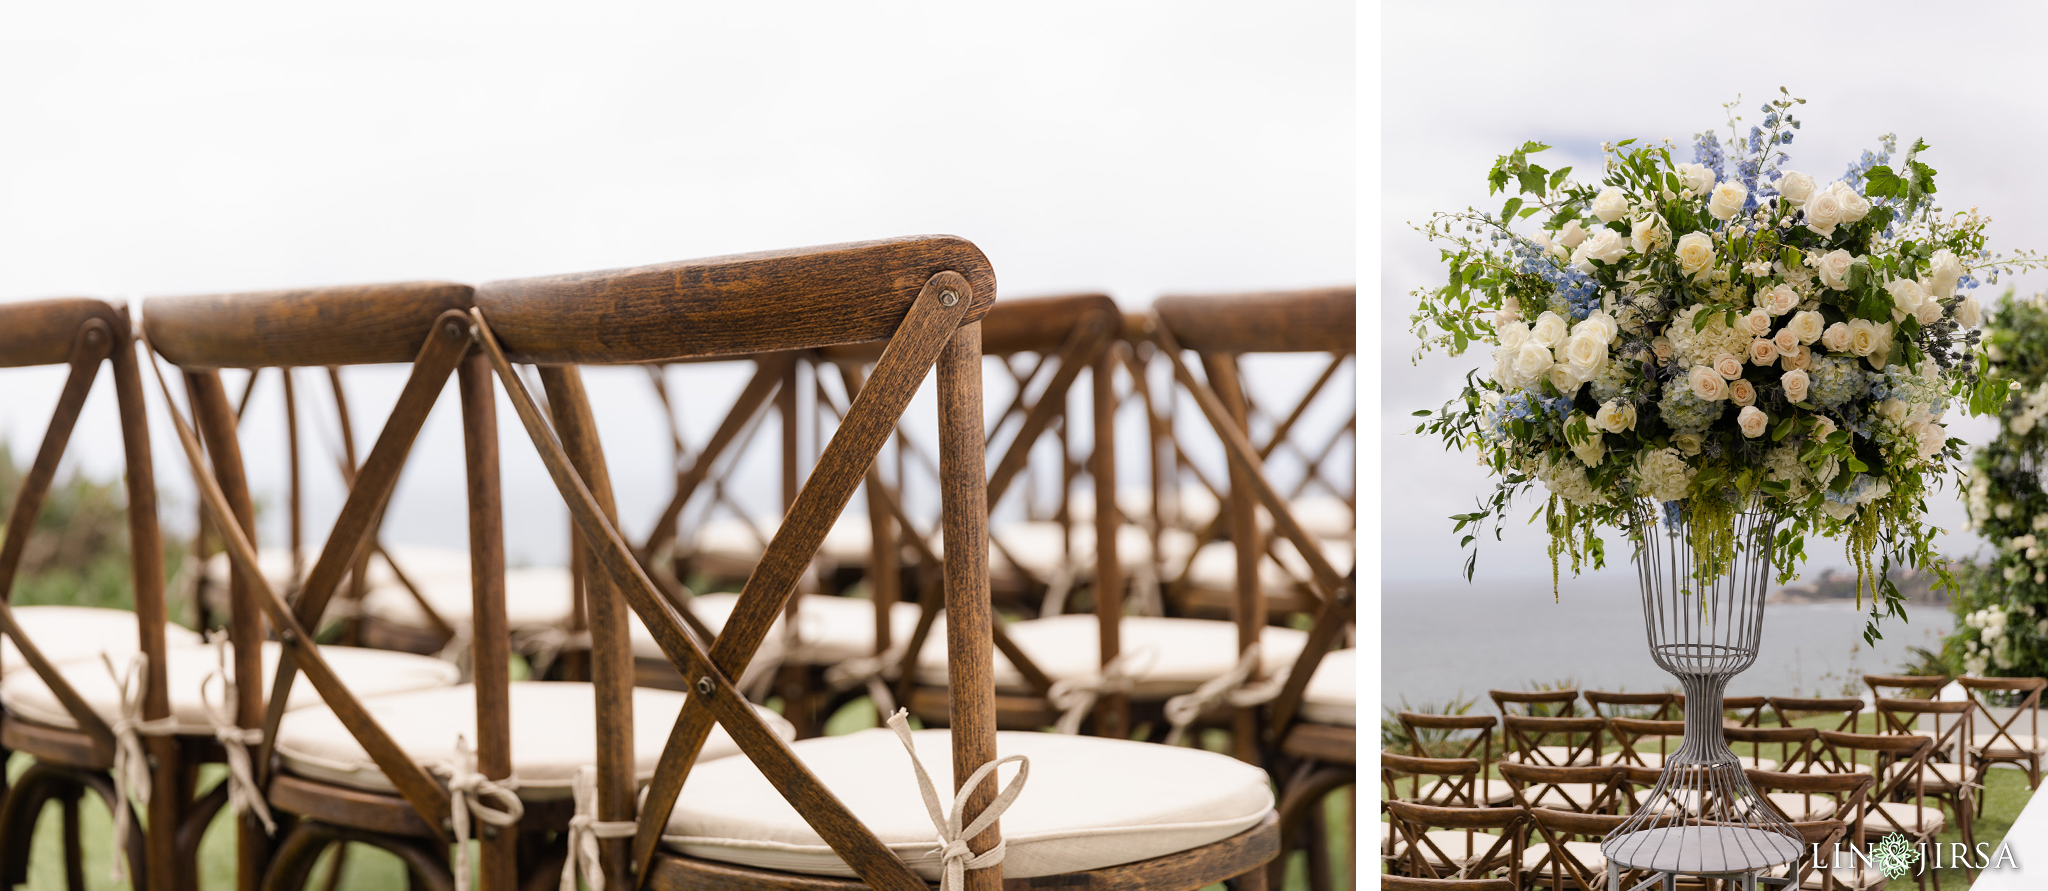 09 Ritz Carlton Laguna Niguel Dana Point Wedding Ceremony Photography